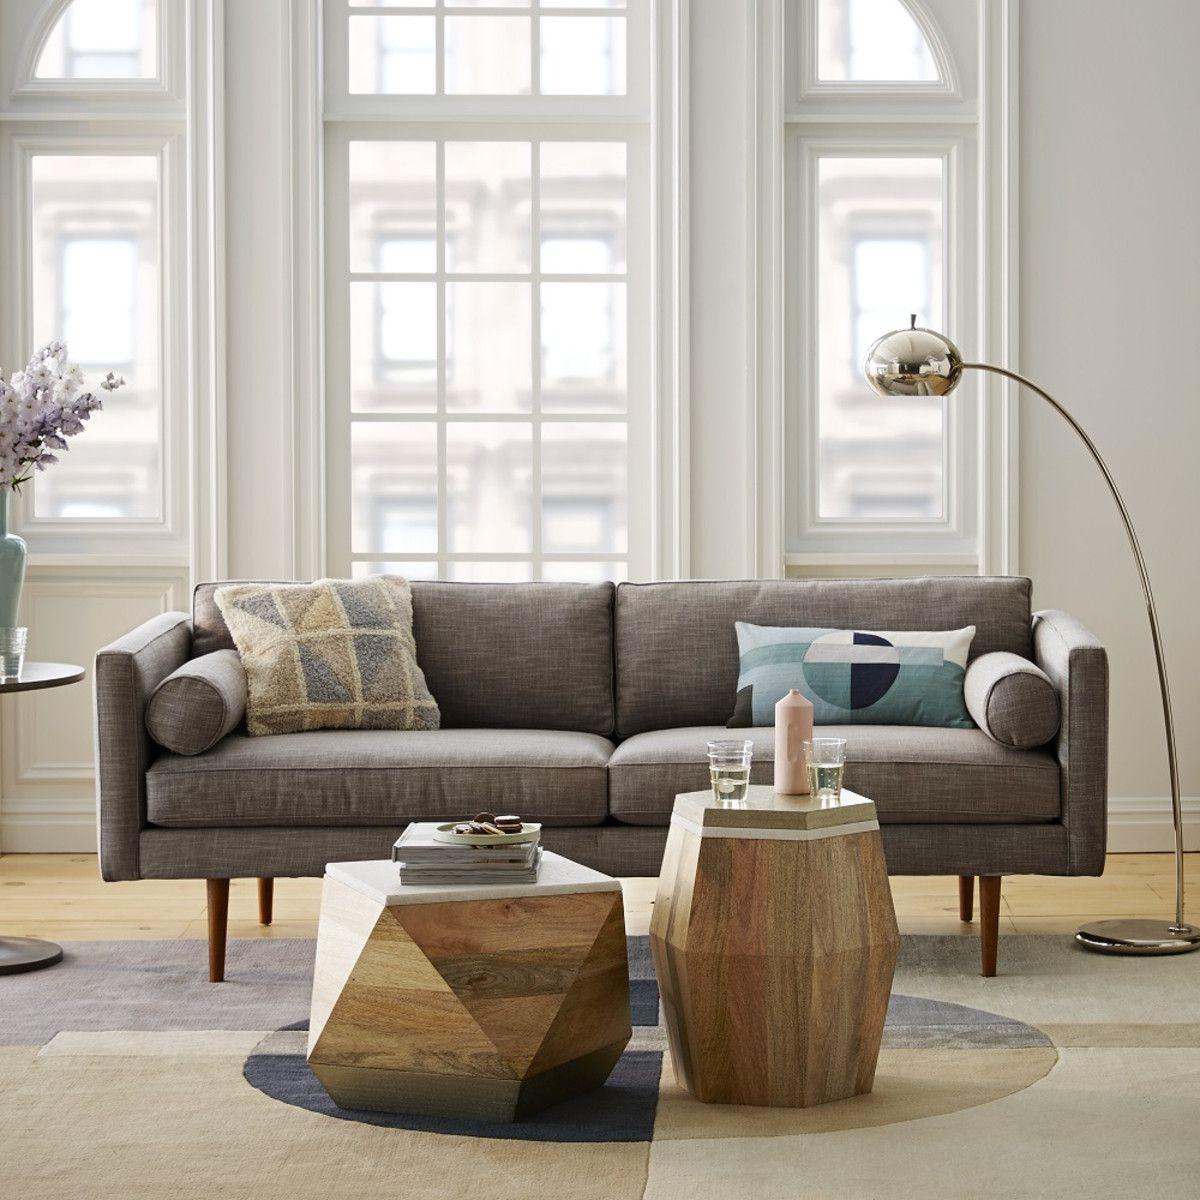 Monroe MidCentury Sofa Shale (203 cm) west elm UK